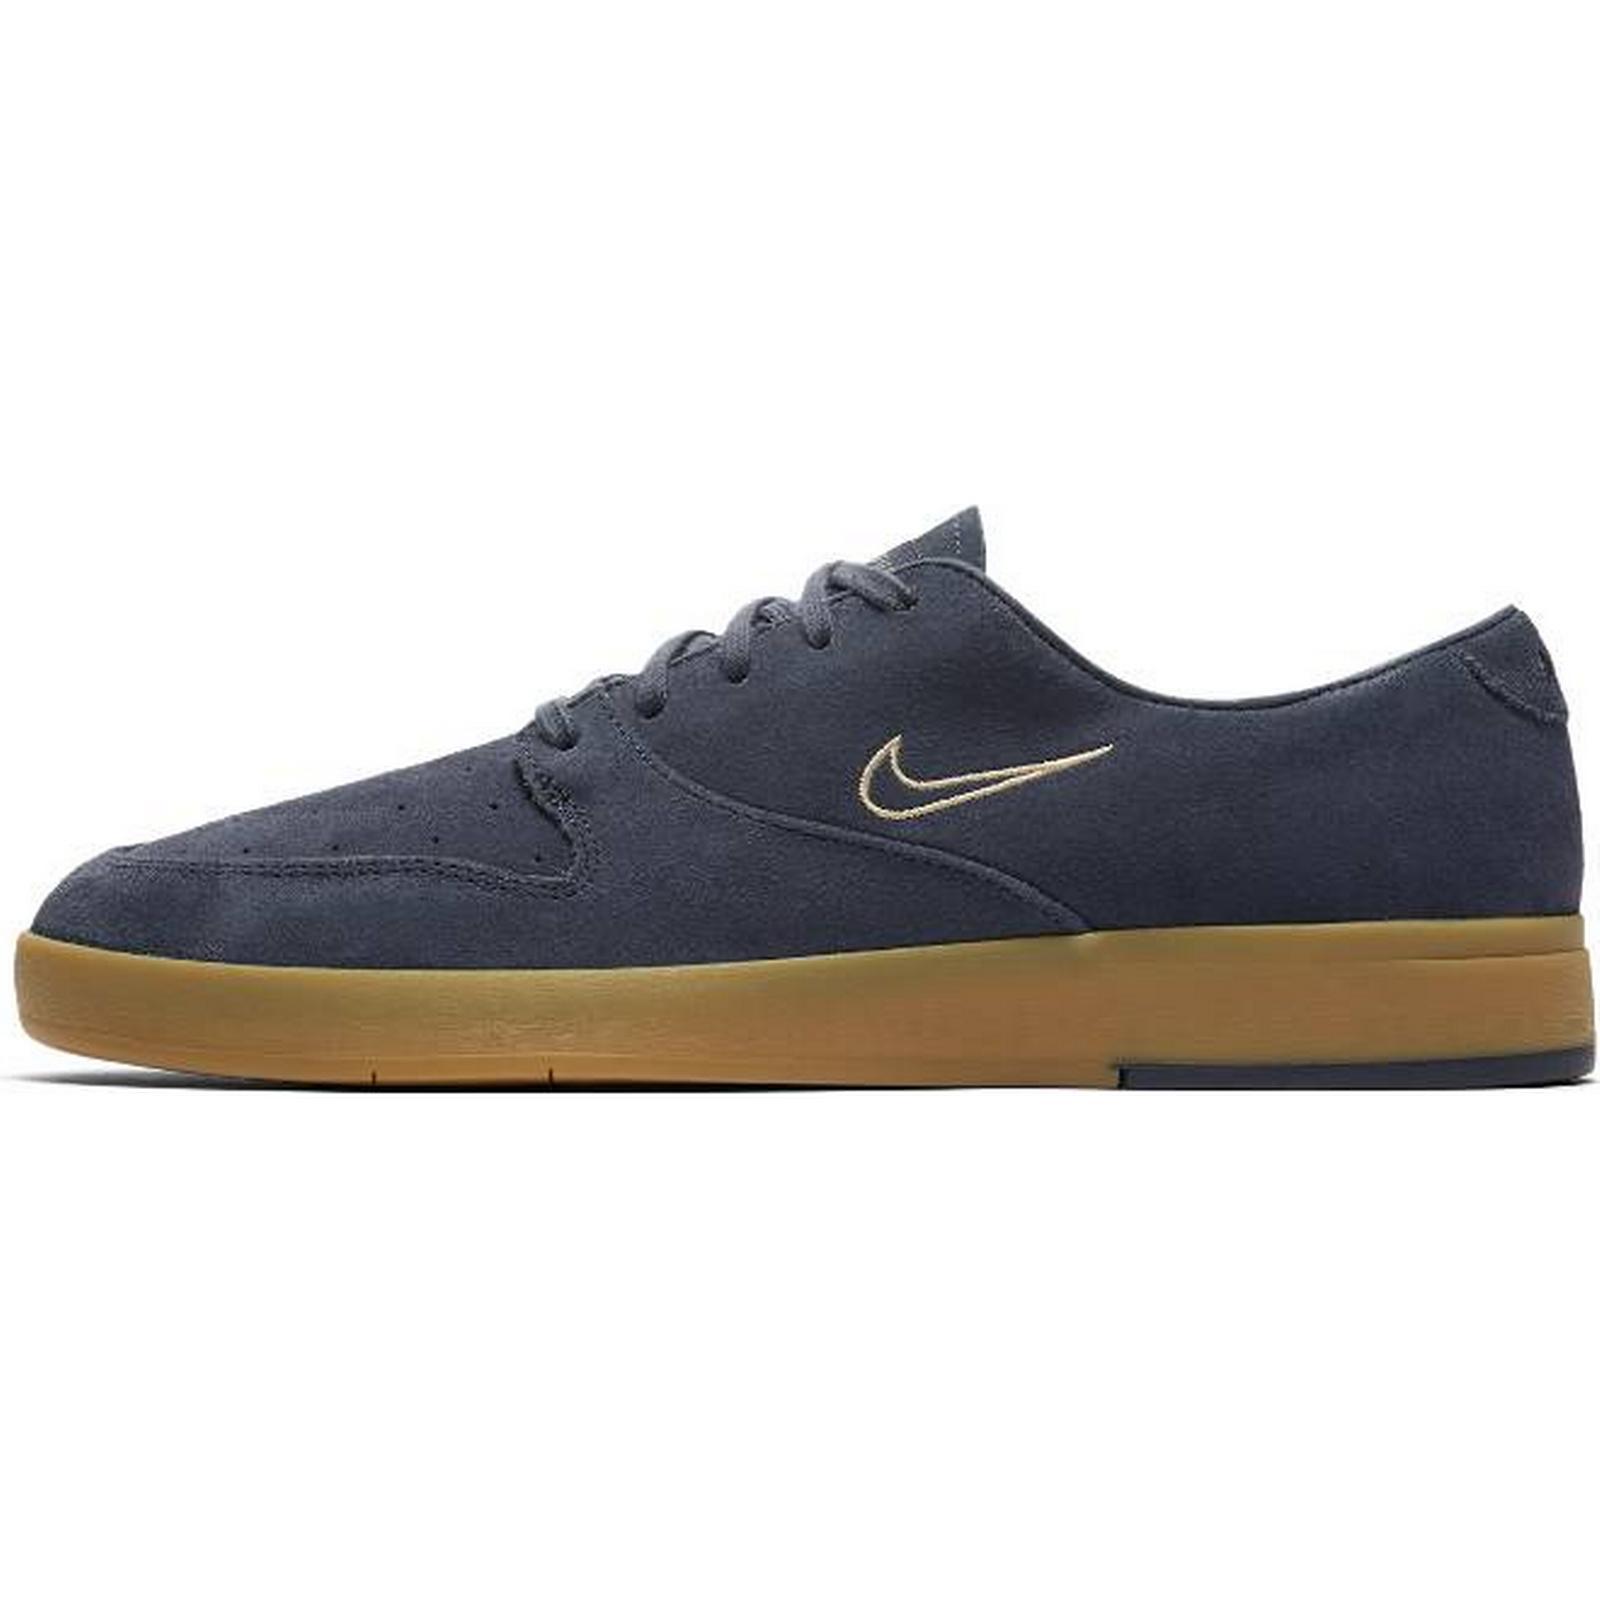 NIKE Męskie Buty Do Skateboardingu Nike Ten SB Zoom Paul Rodriguez Ten Nike 99c52e